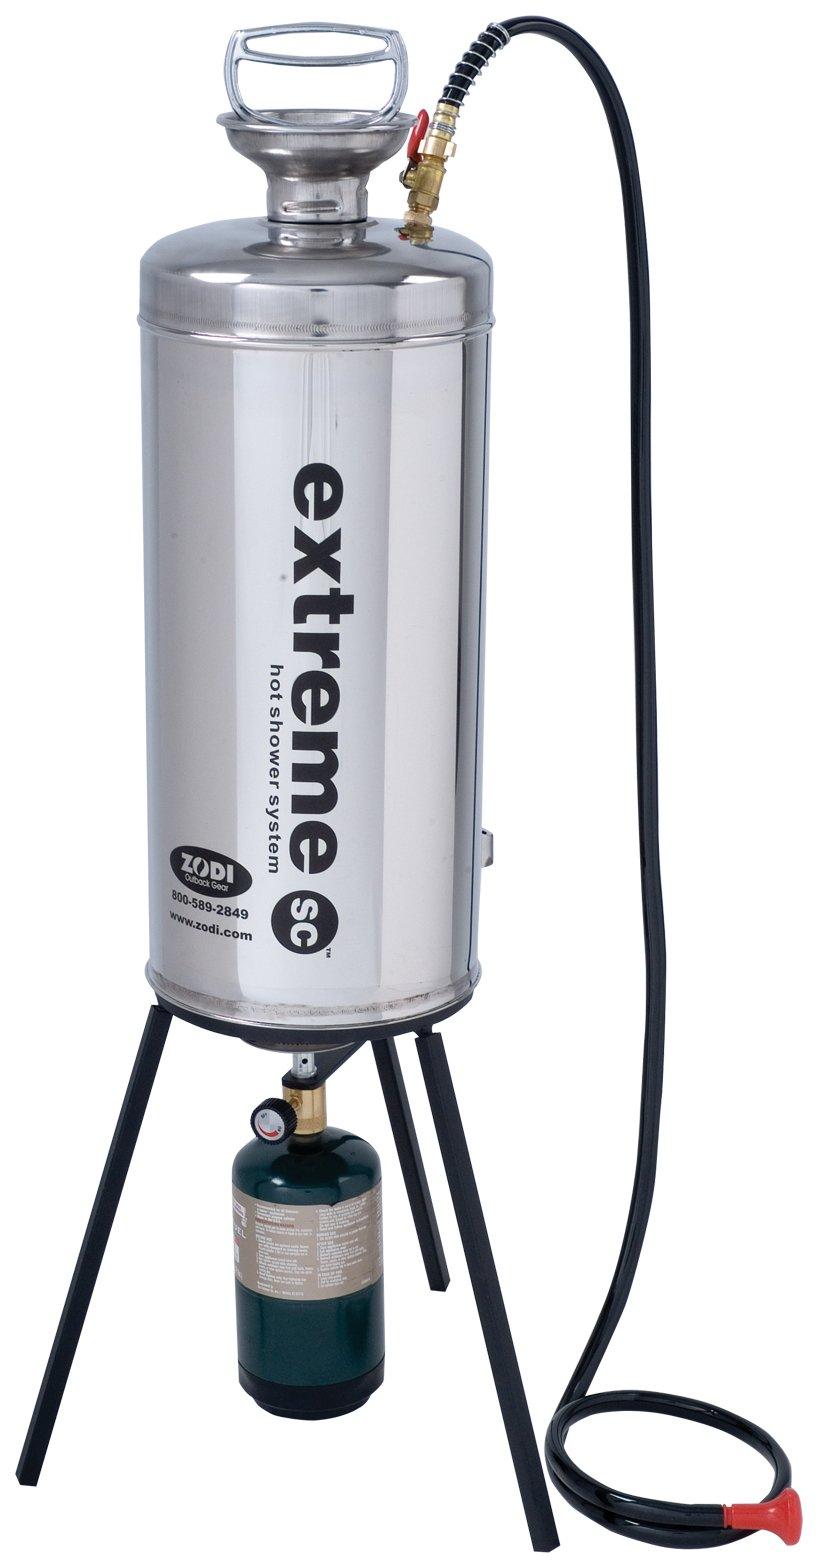 Zodi Extreme SC Portable Shower with Tripod Stove by Zodi